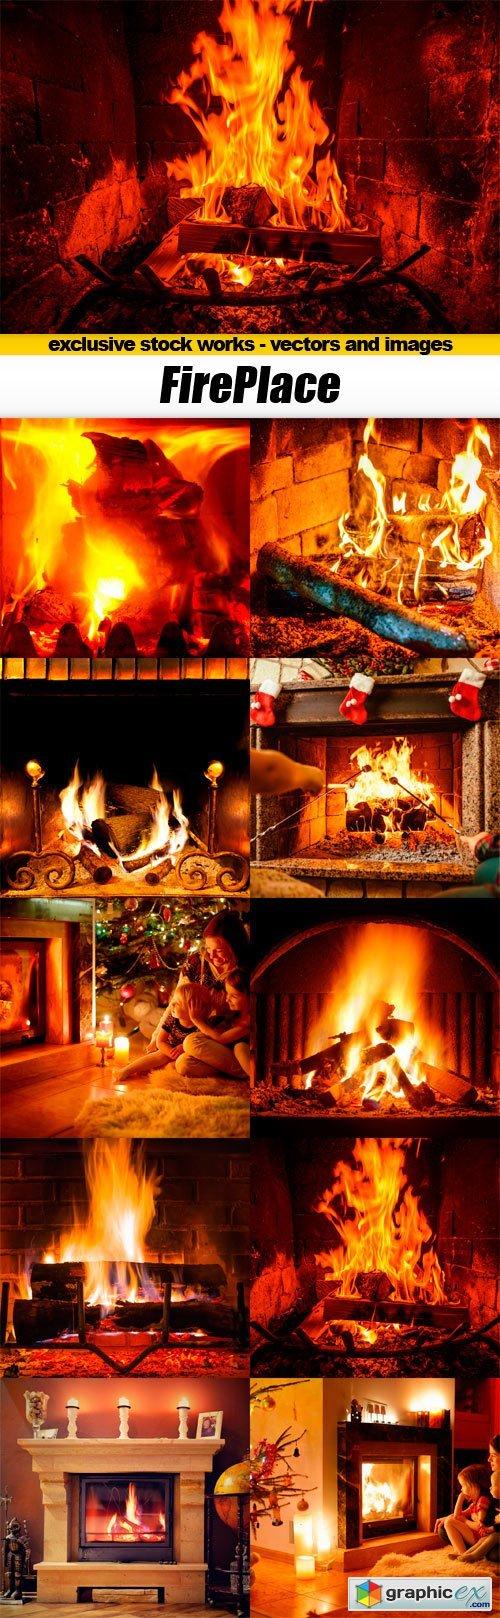 Fireplace - 10x JPEGs